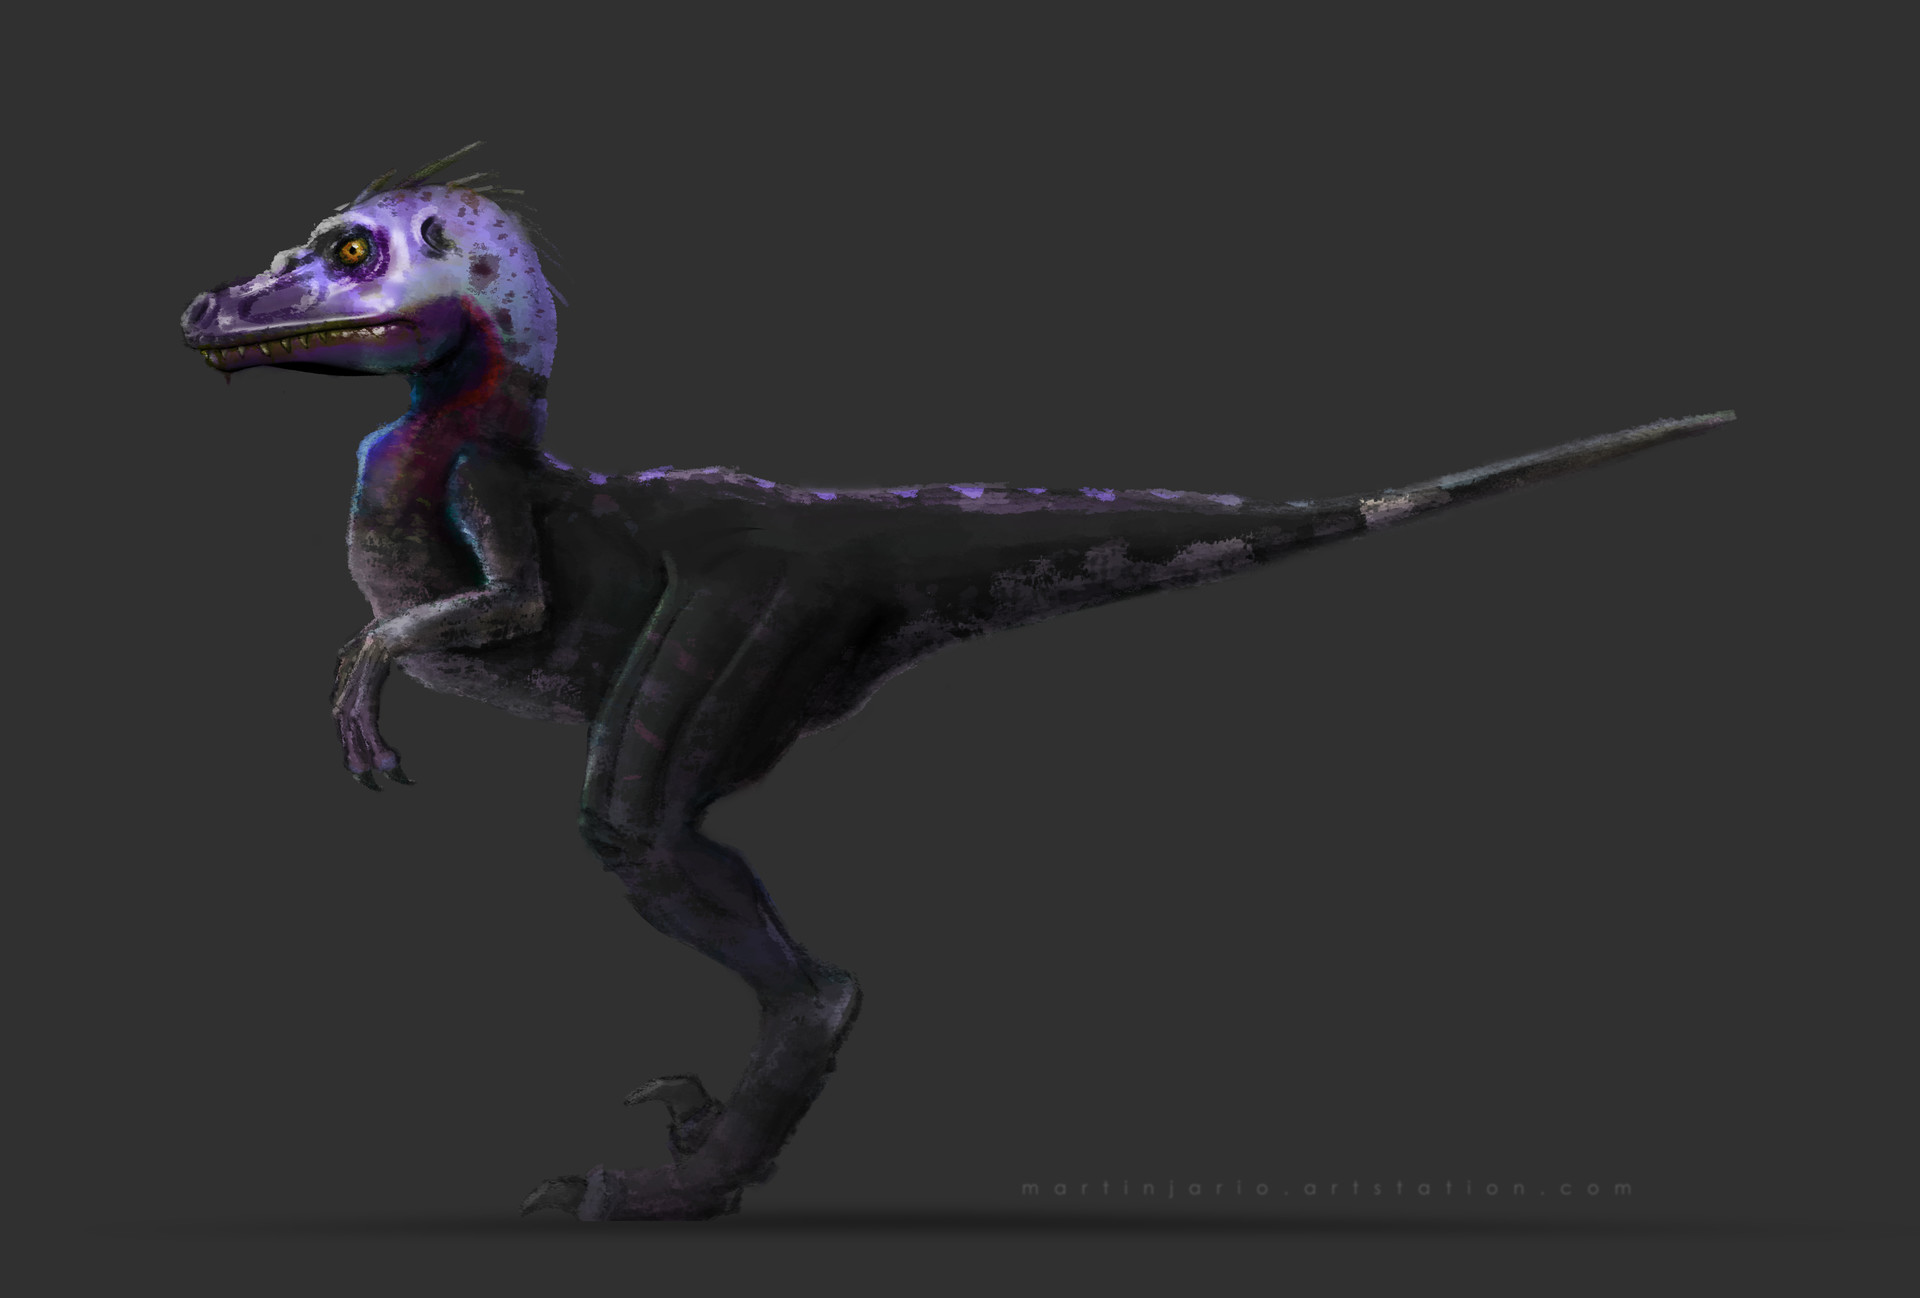 Martin jario martinjario velociraptor 03